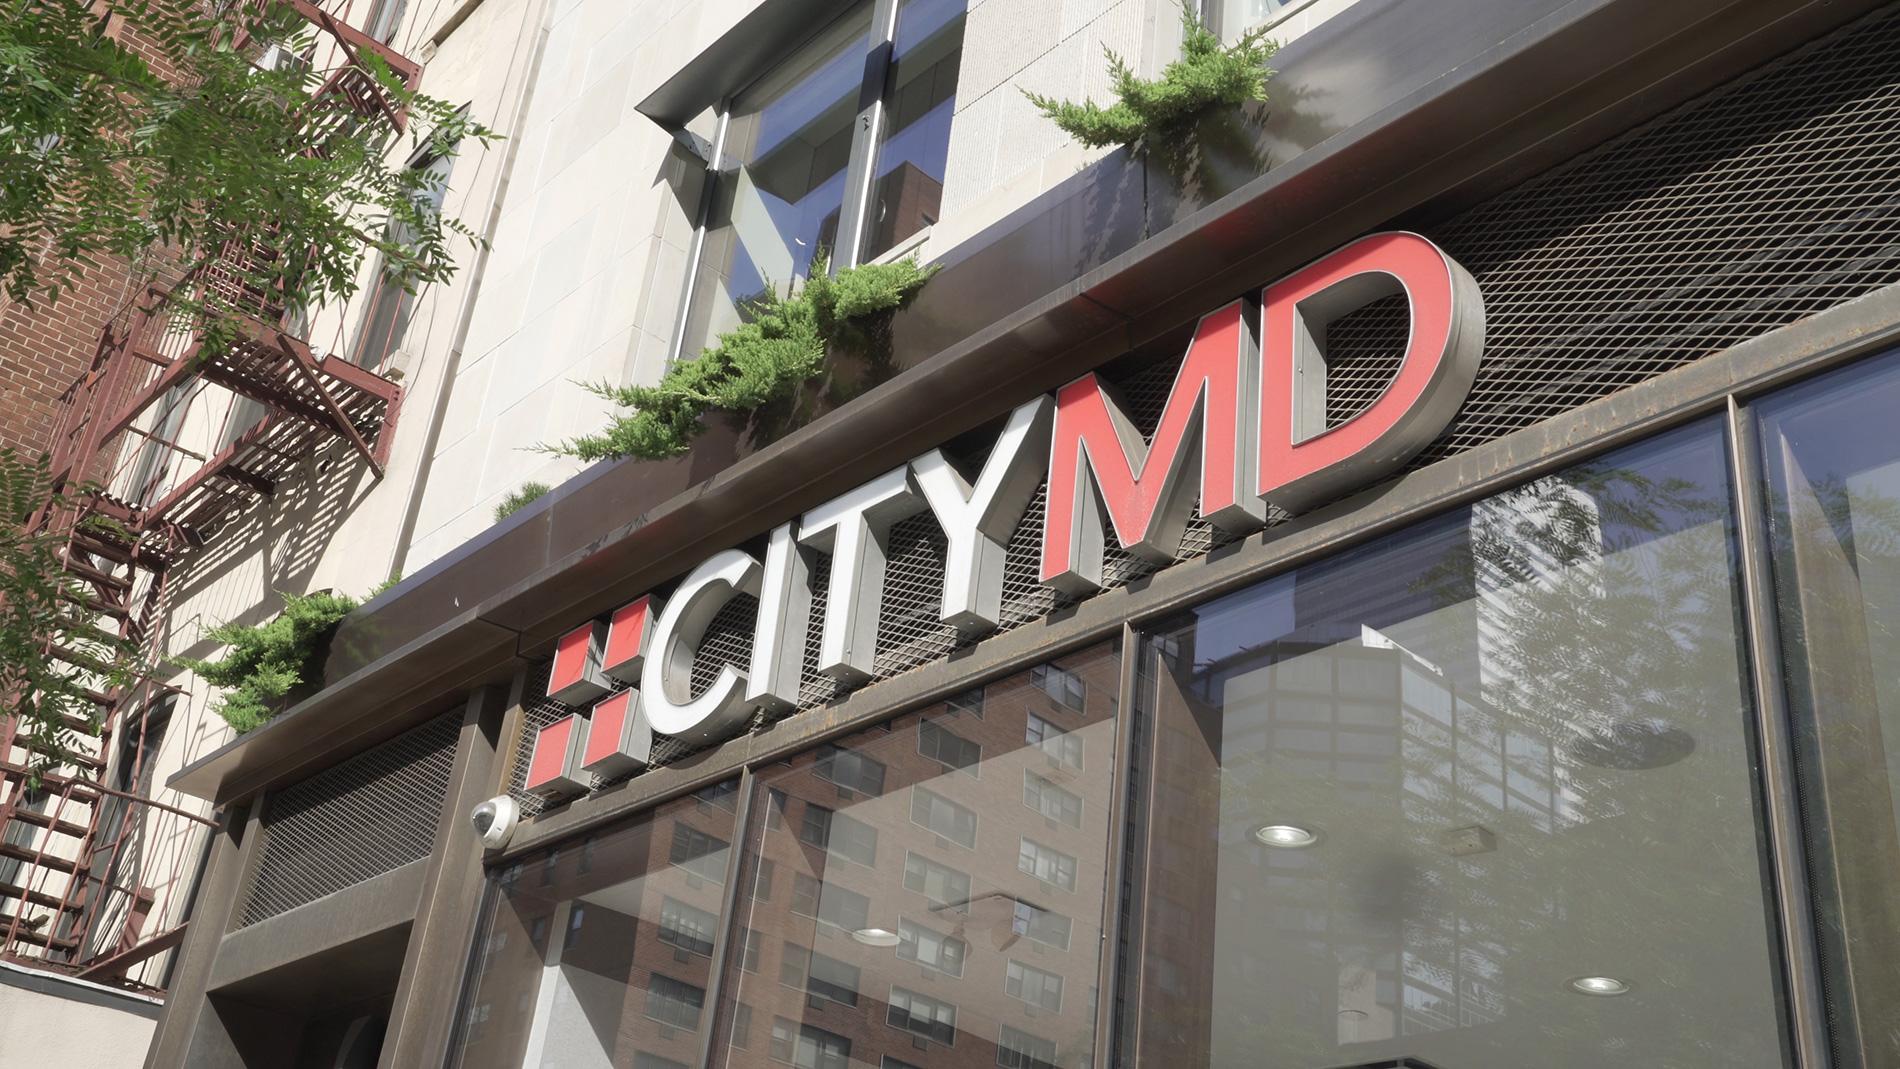 Citymd case study